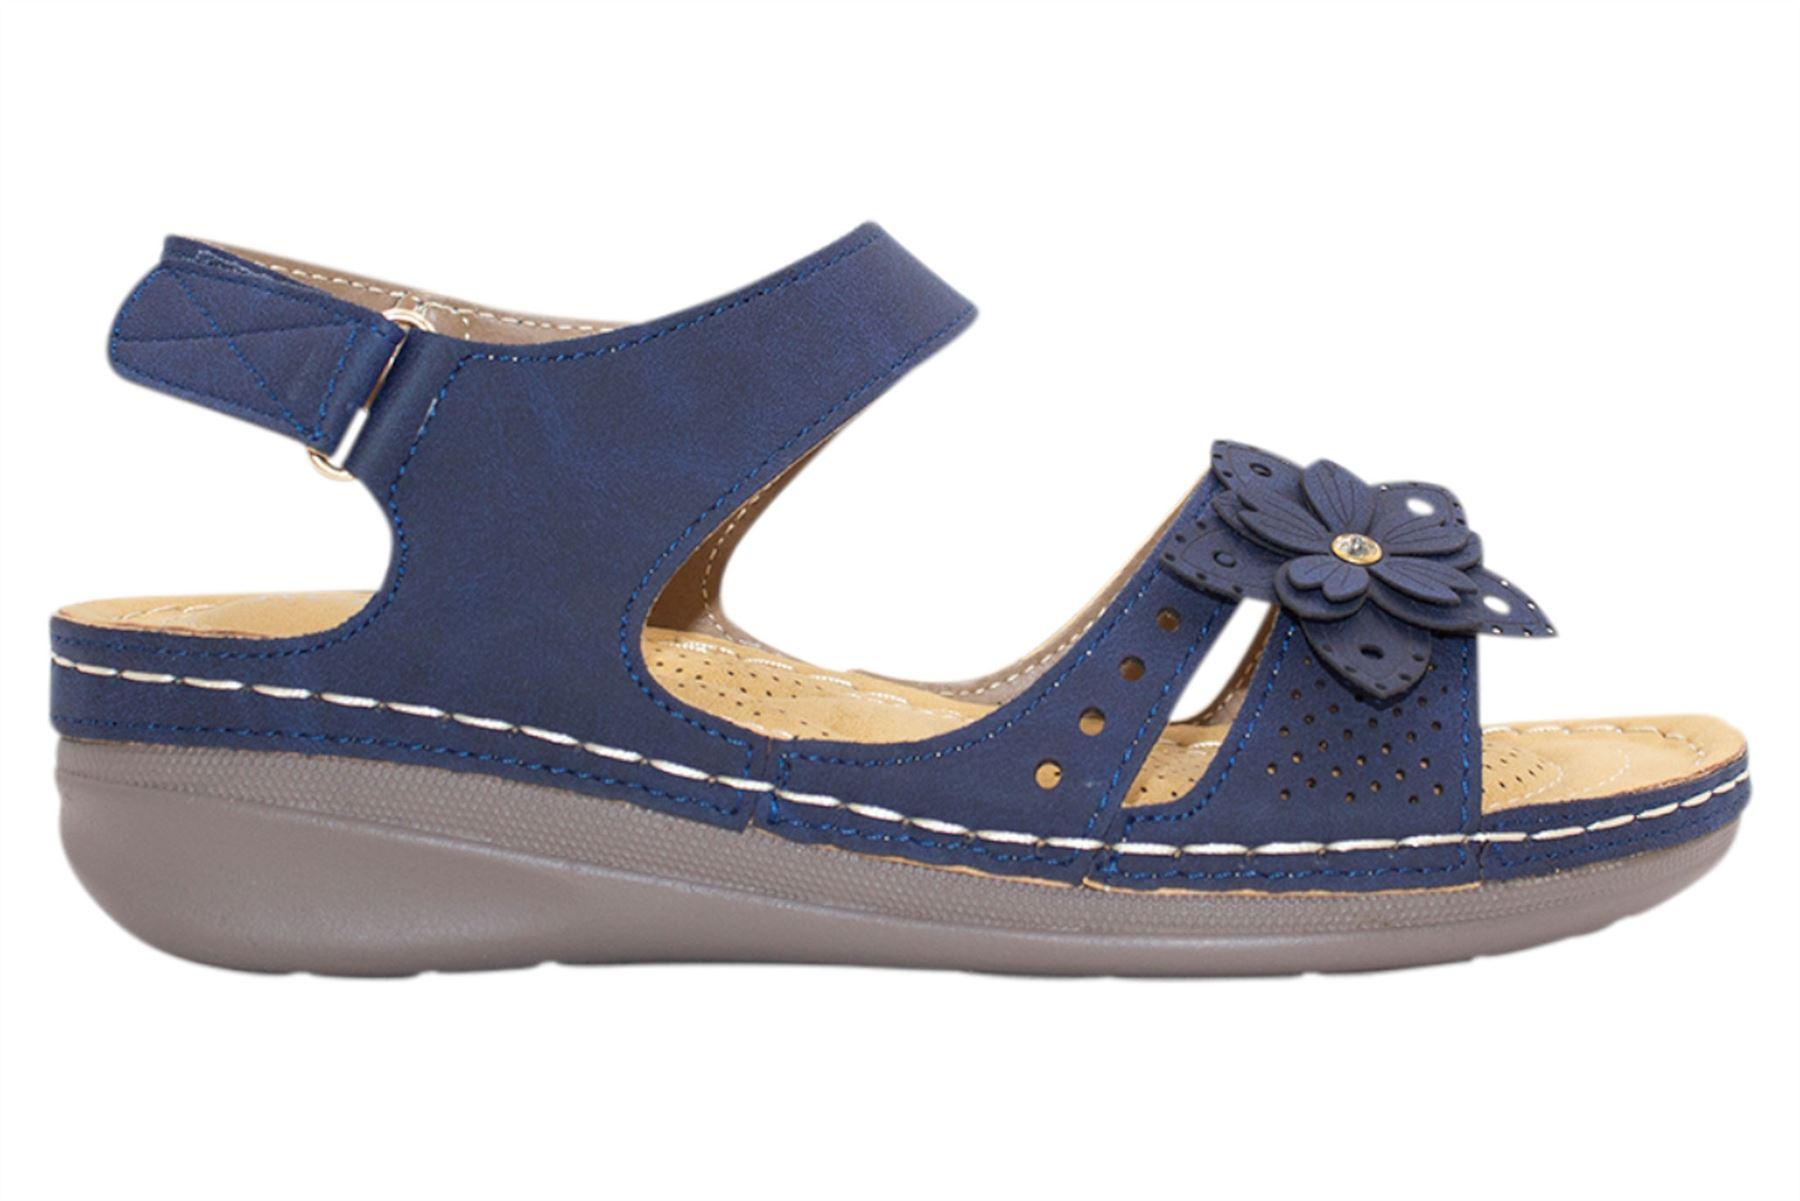 Ladies-Wedge-Heel-Sandal-Womens-Comfort-Cushion-Strapy-Summer-Shoes miniatura 37